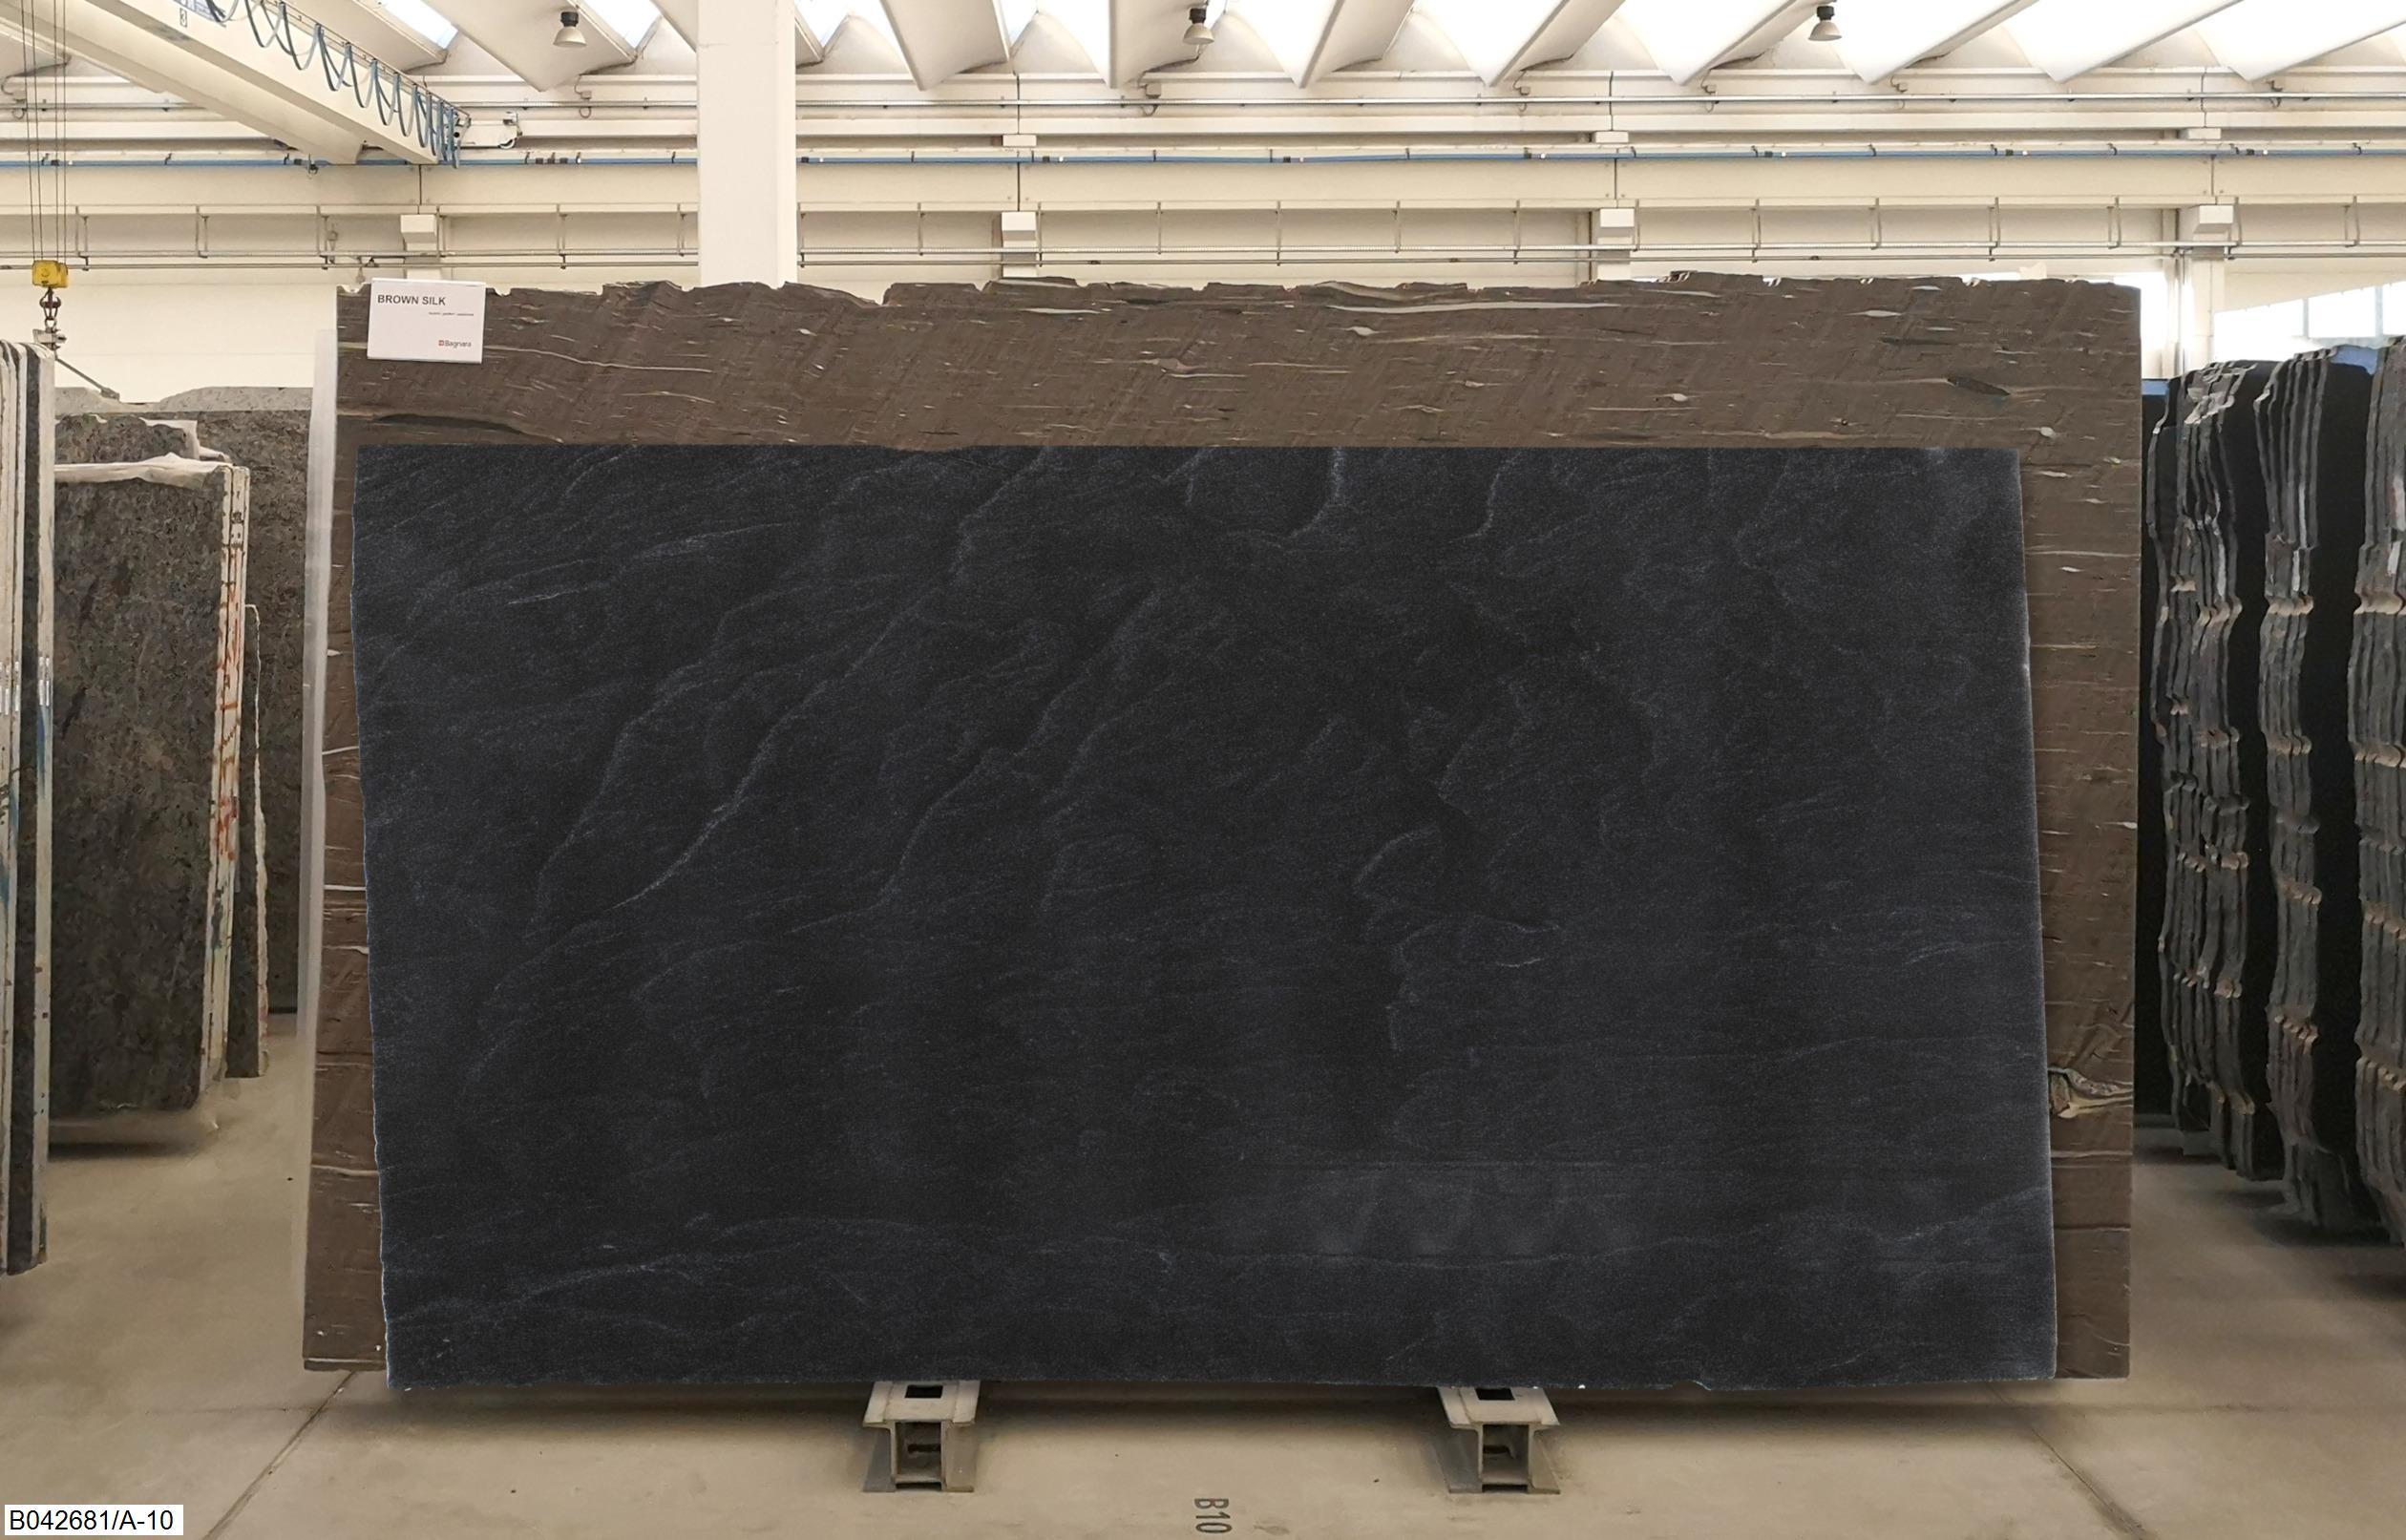 AMERICAN BLACK FANTASTIC - LASTRE LUCIDE Foto: 1_59680_39223.jpg